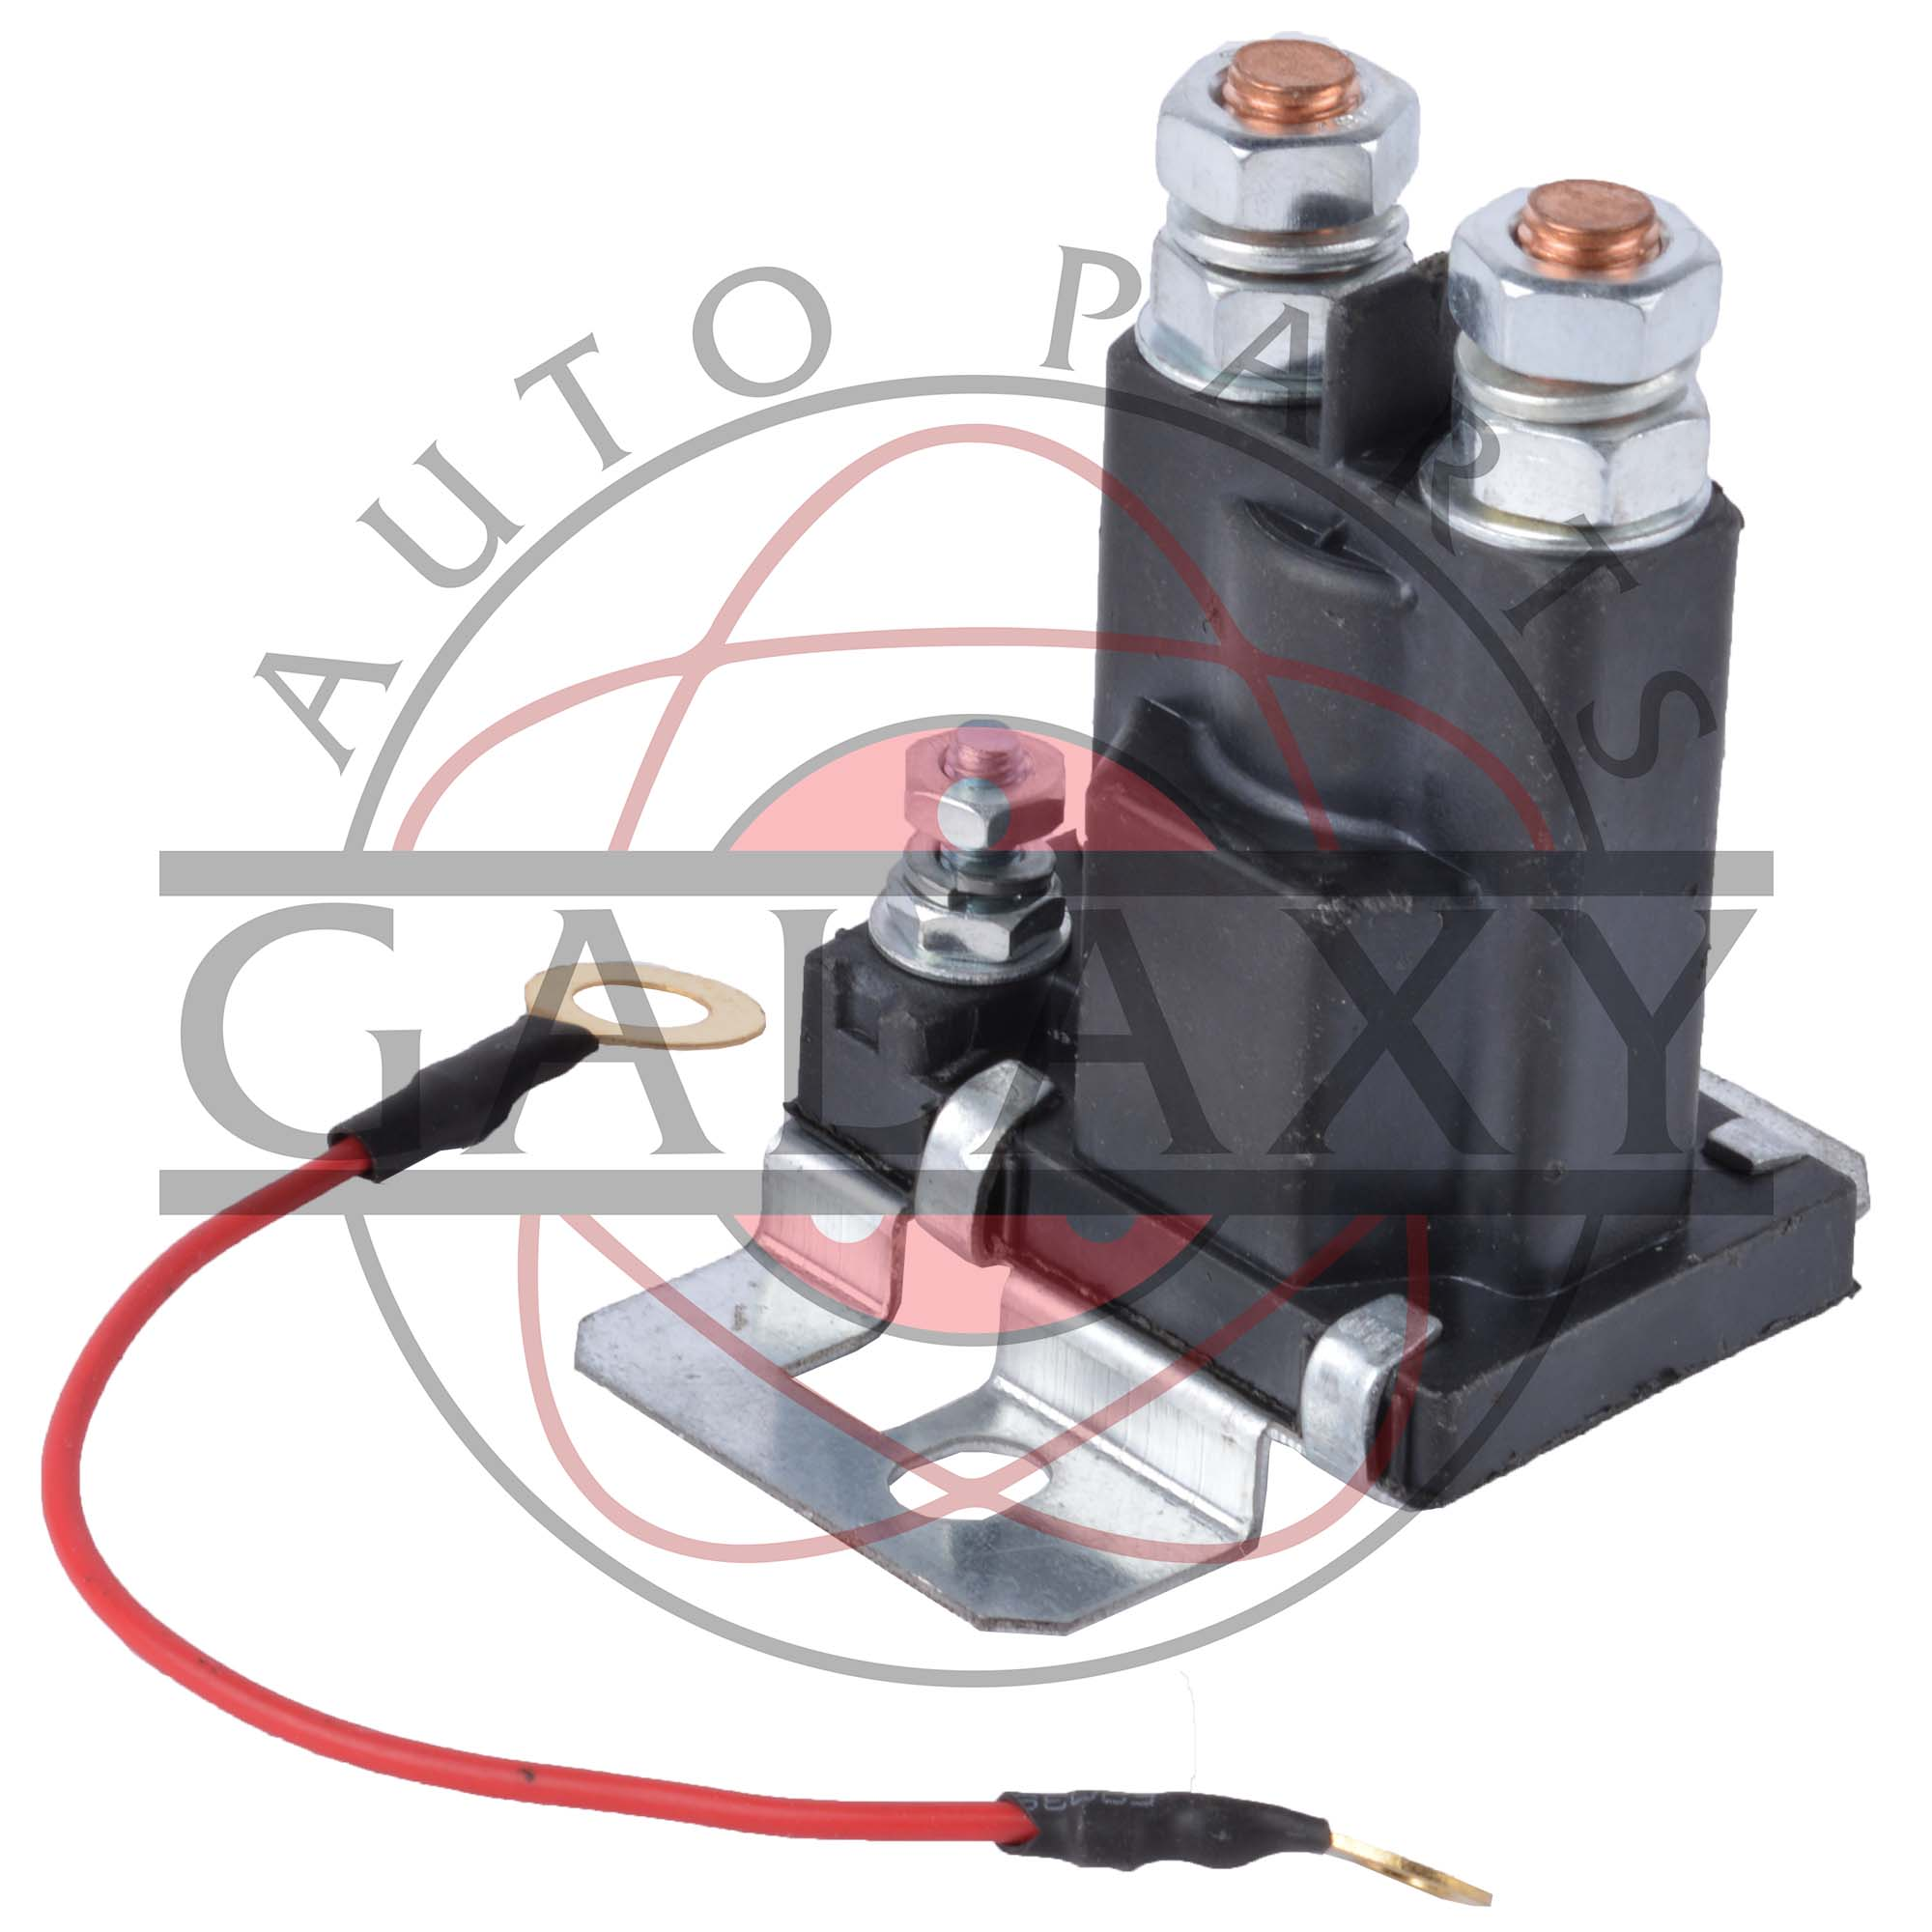 meyer plow pump delco 10si alternator wiring diagram western snow fisher snowplow solenoid replaces w56134